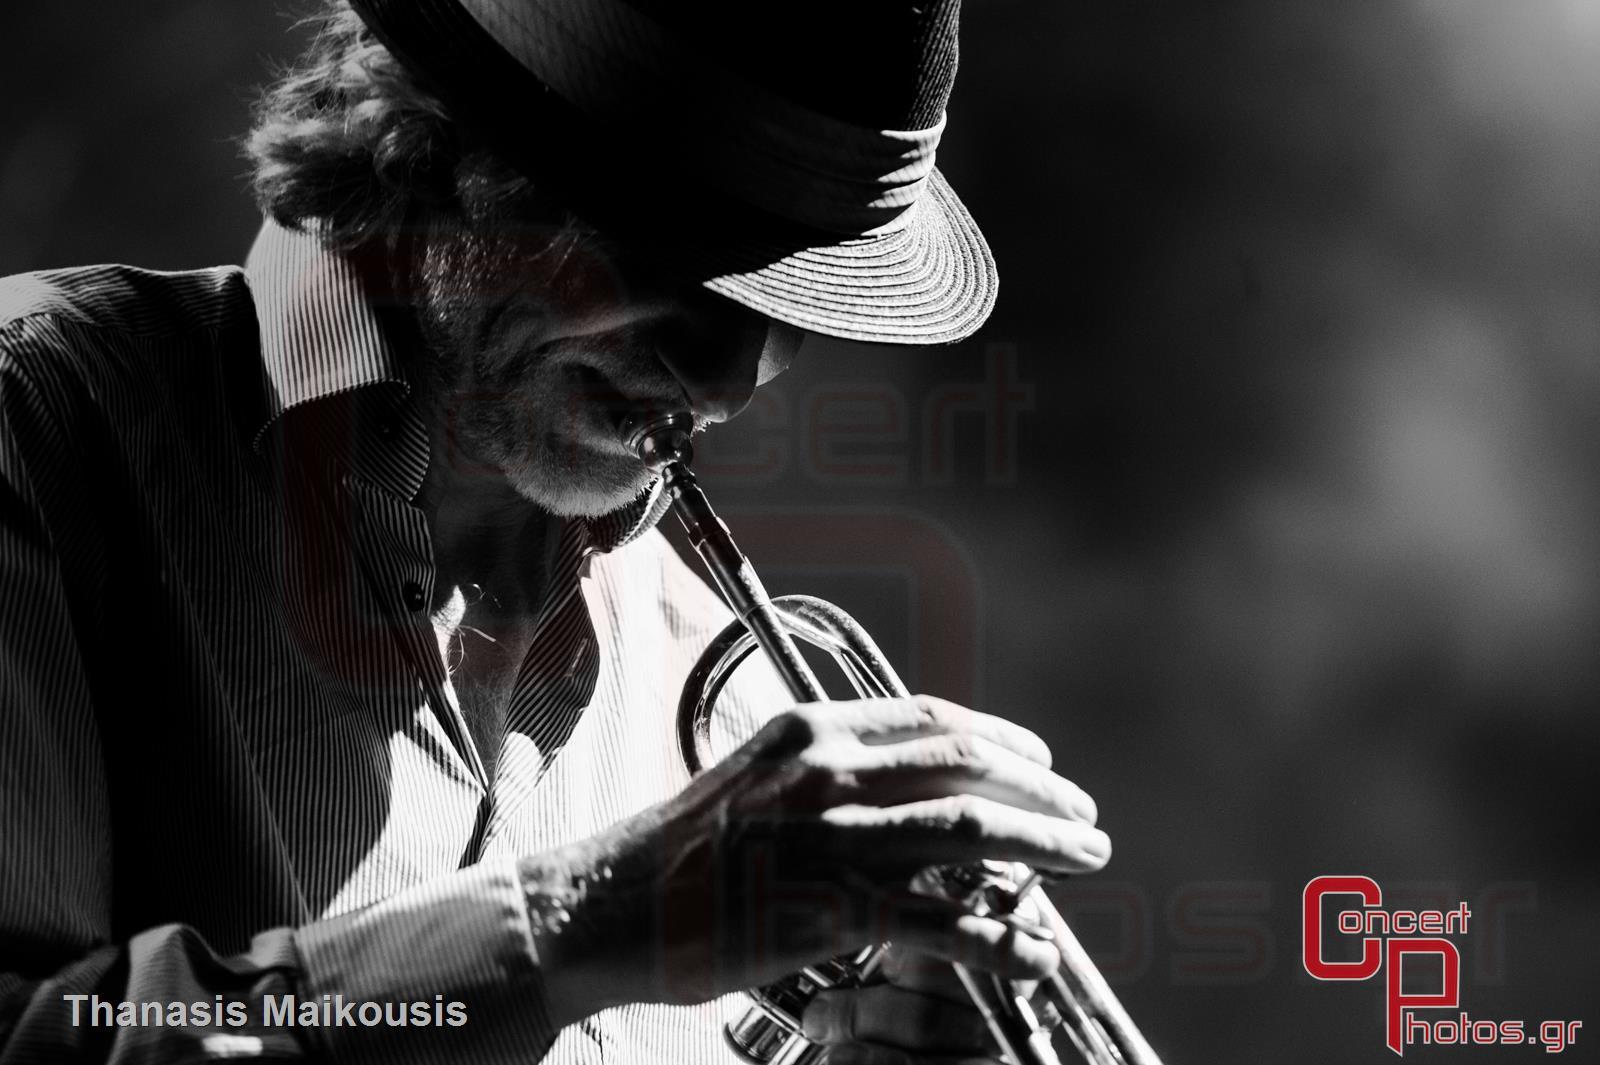 Active Member - Τραγούδα μας να φύγει το σκοτάδι- photographer: Thanasis Maikousis - concertphotos_-5468